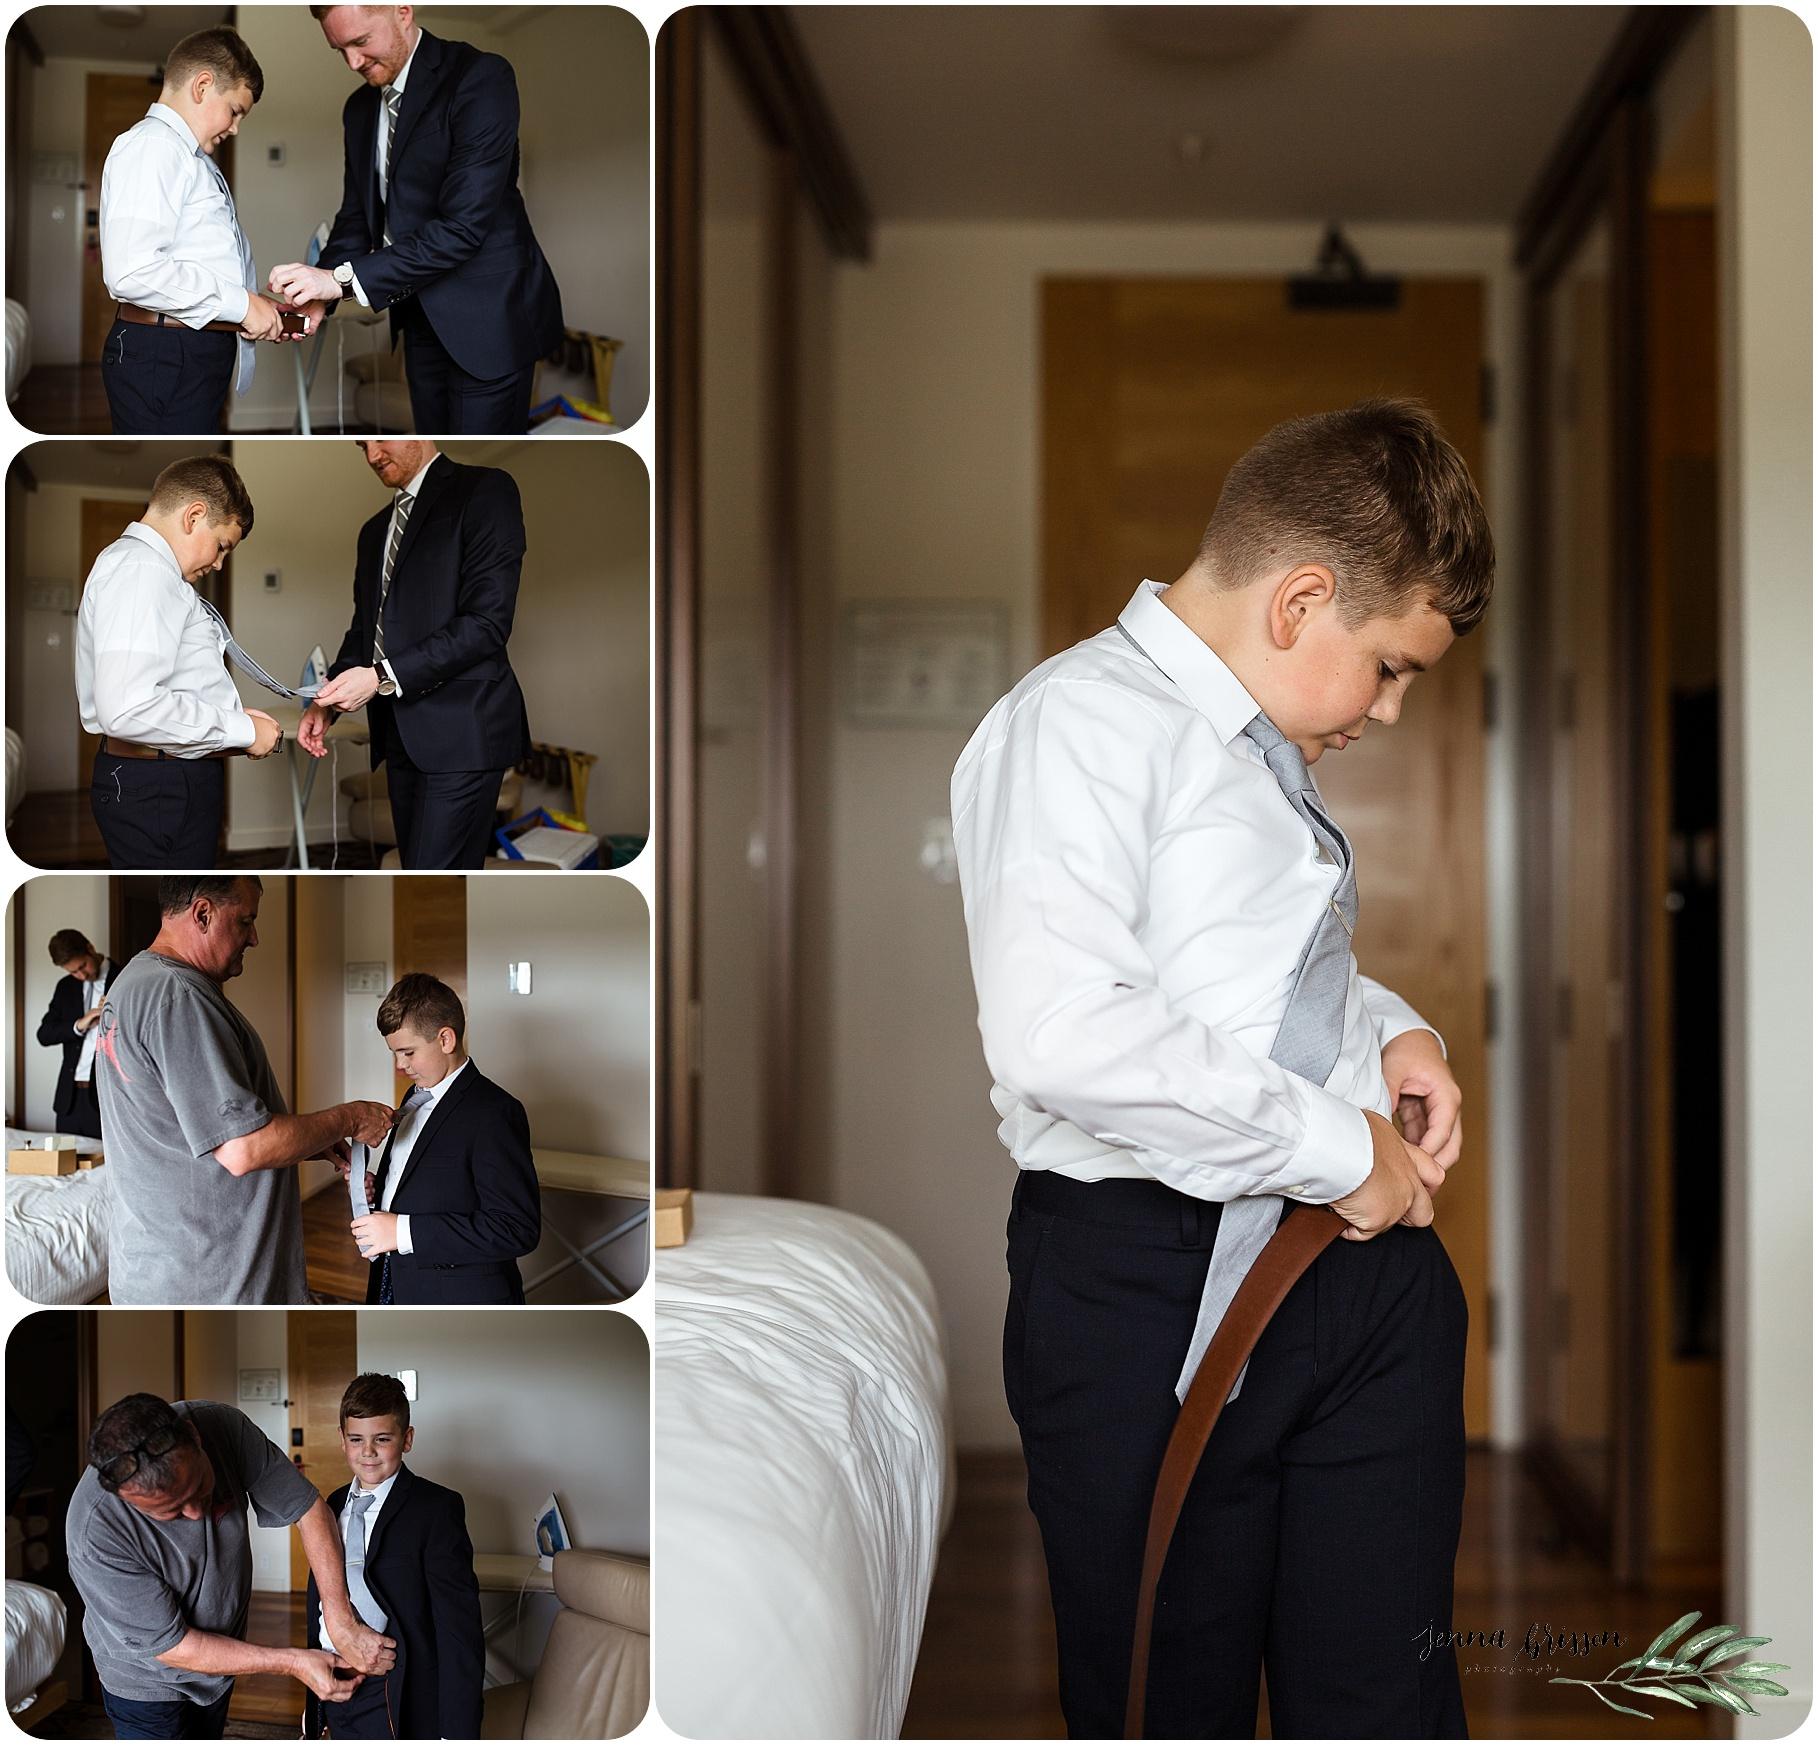 Hotel Vermont Wedding Getting Ready